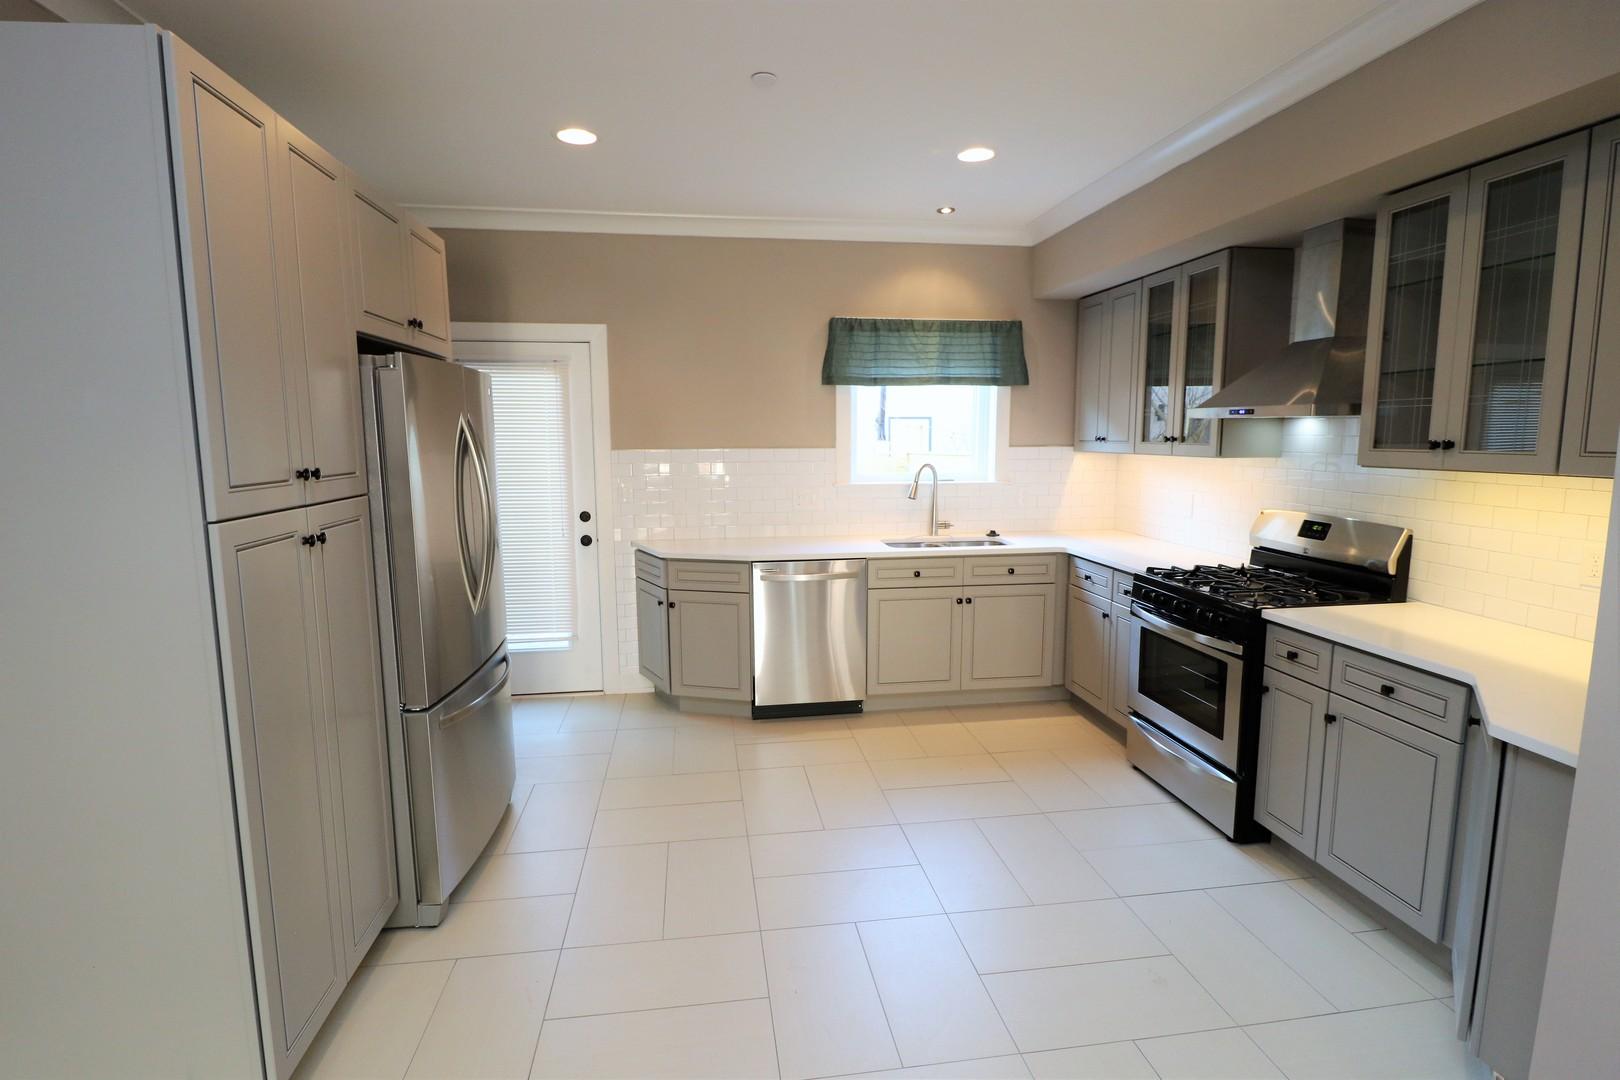 1816 Latona St Must See 3 Bedroom, 2.5 Bath New Construction Home!